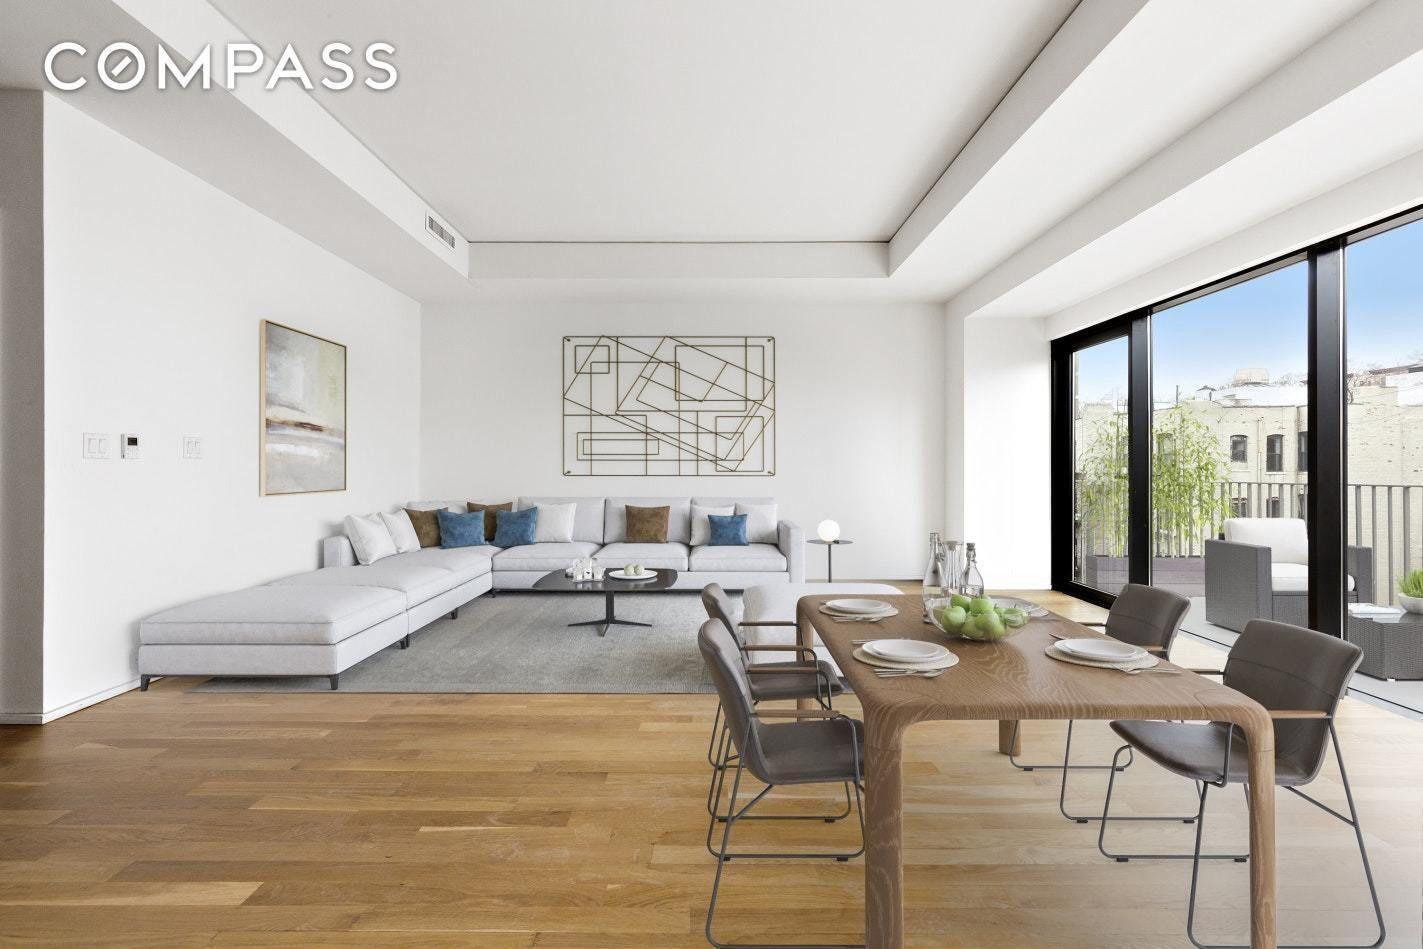 Apartment for sale at 2457 Frederick Douglass Boulevard, Apt 5-B